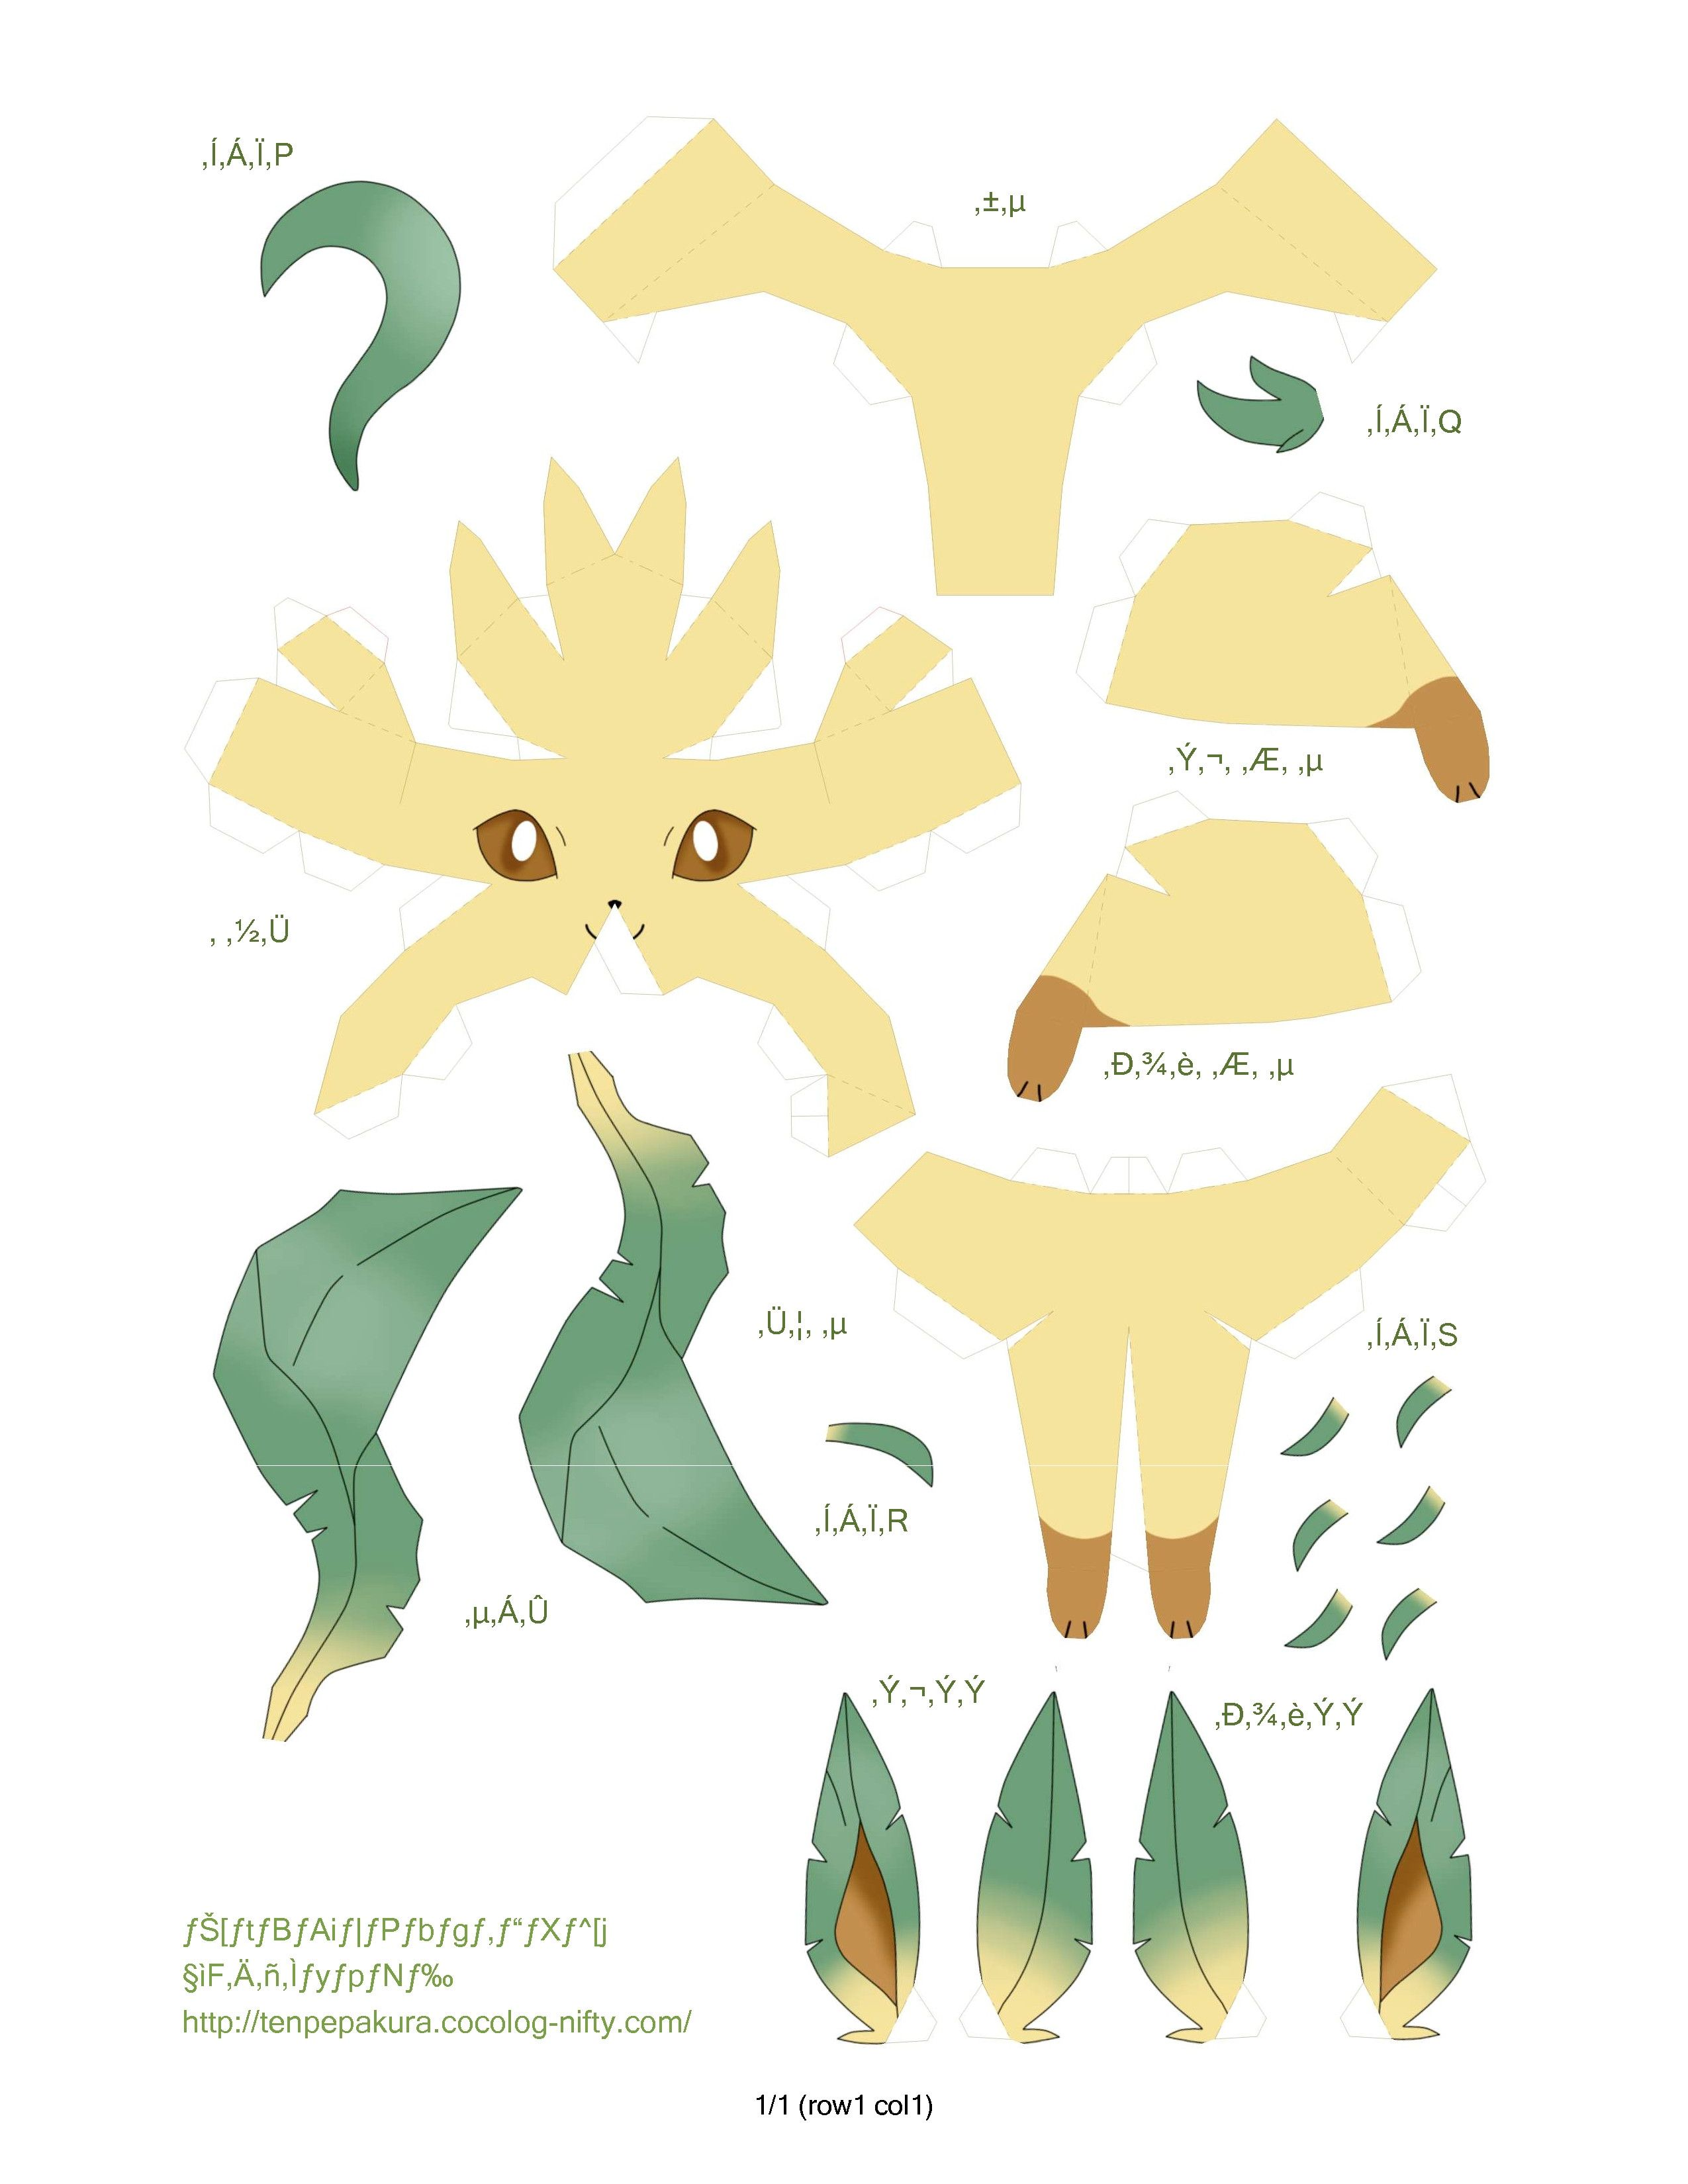 Eeveelutions Papercraft Diy Pinterest Papercraft Pokmon And